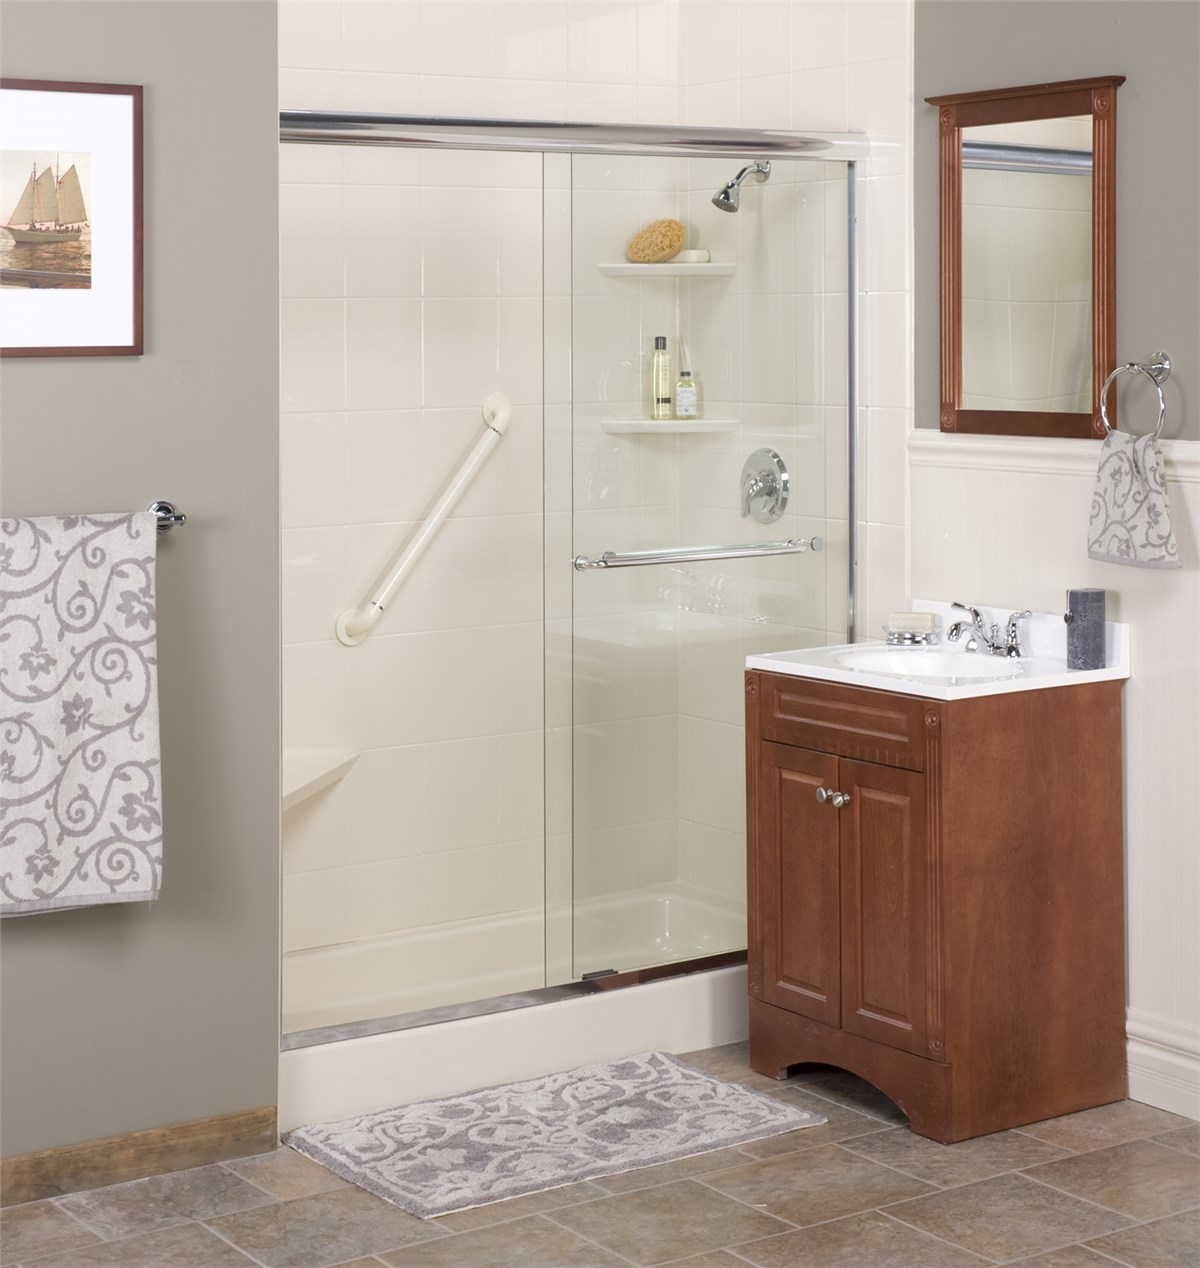 Shower Doors | Boston Bathroom Remodeling | Newpro